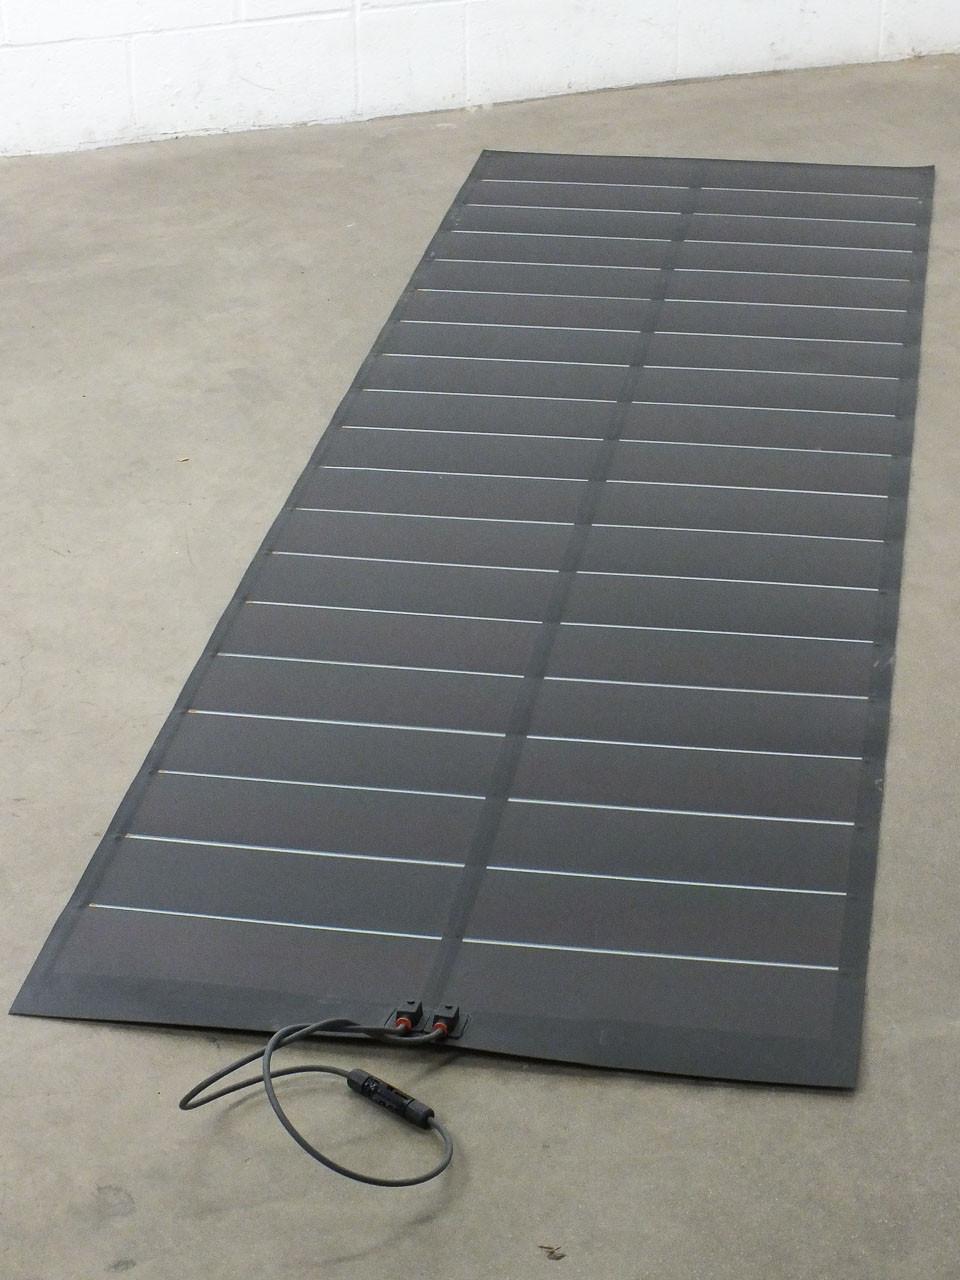 Xunlight XUS19-134 134 WATT Rollable Camping RV Solar Panel NO Sticky Backing